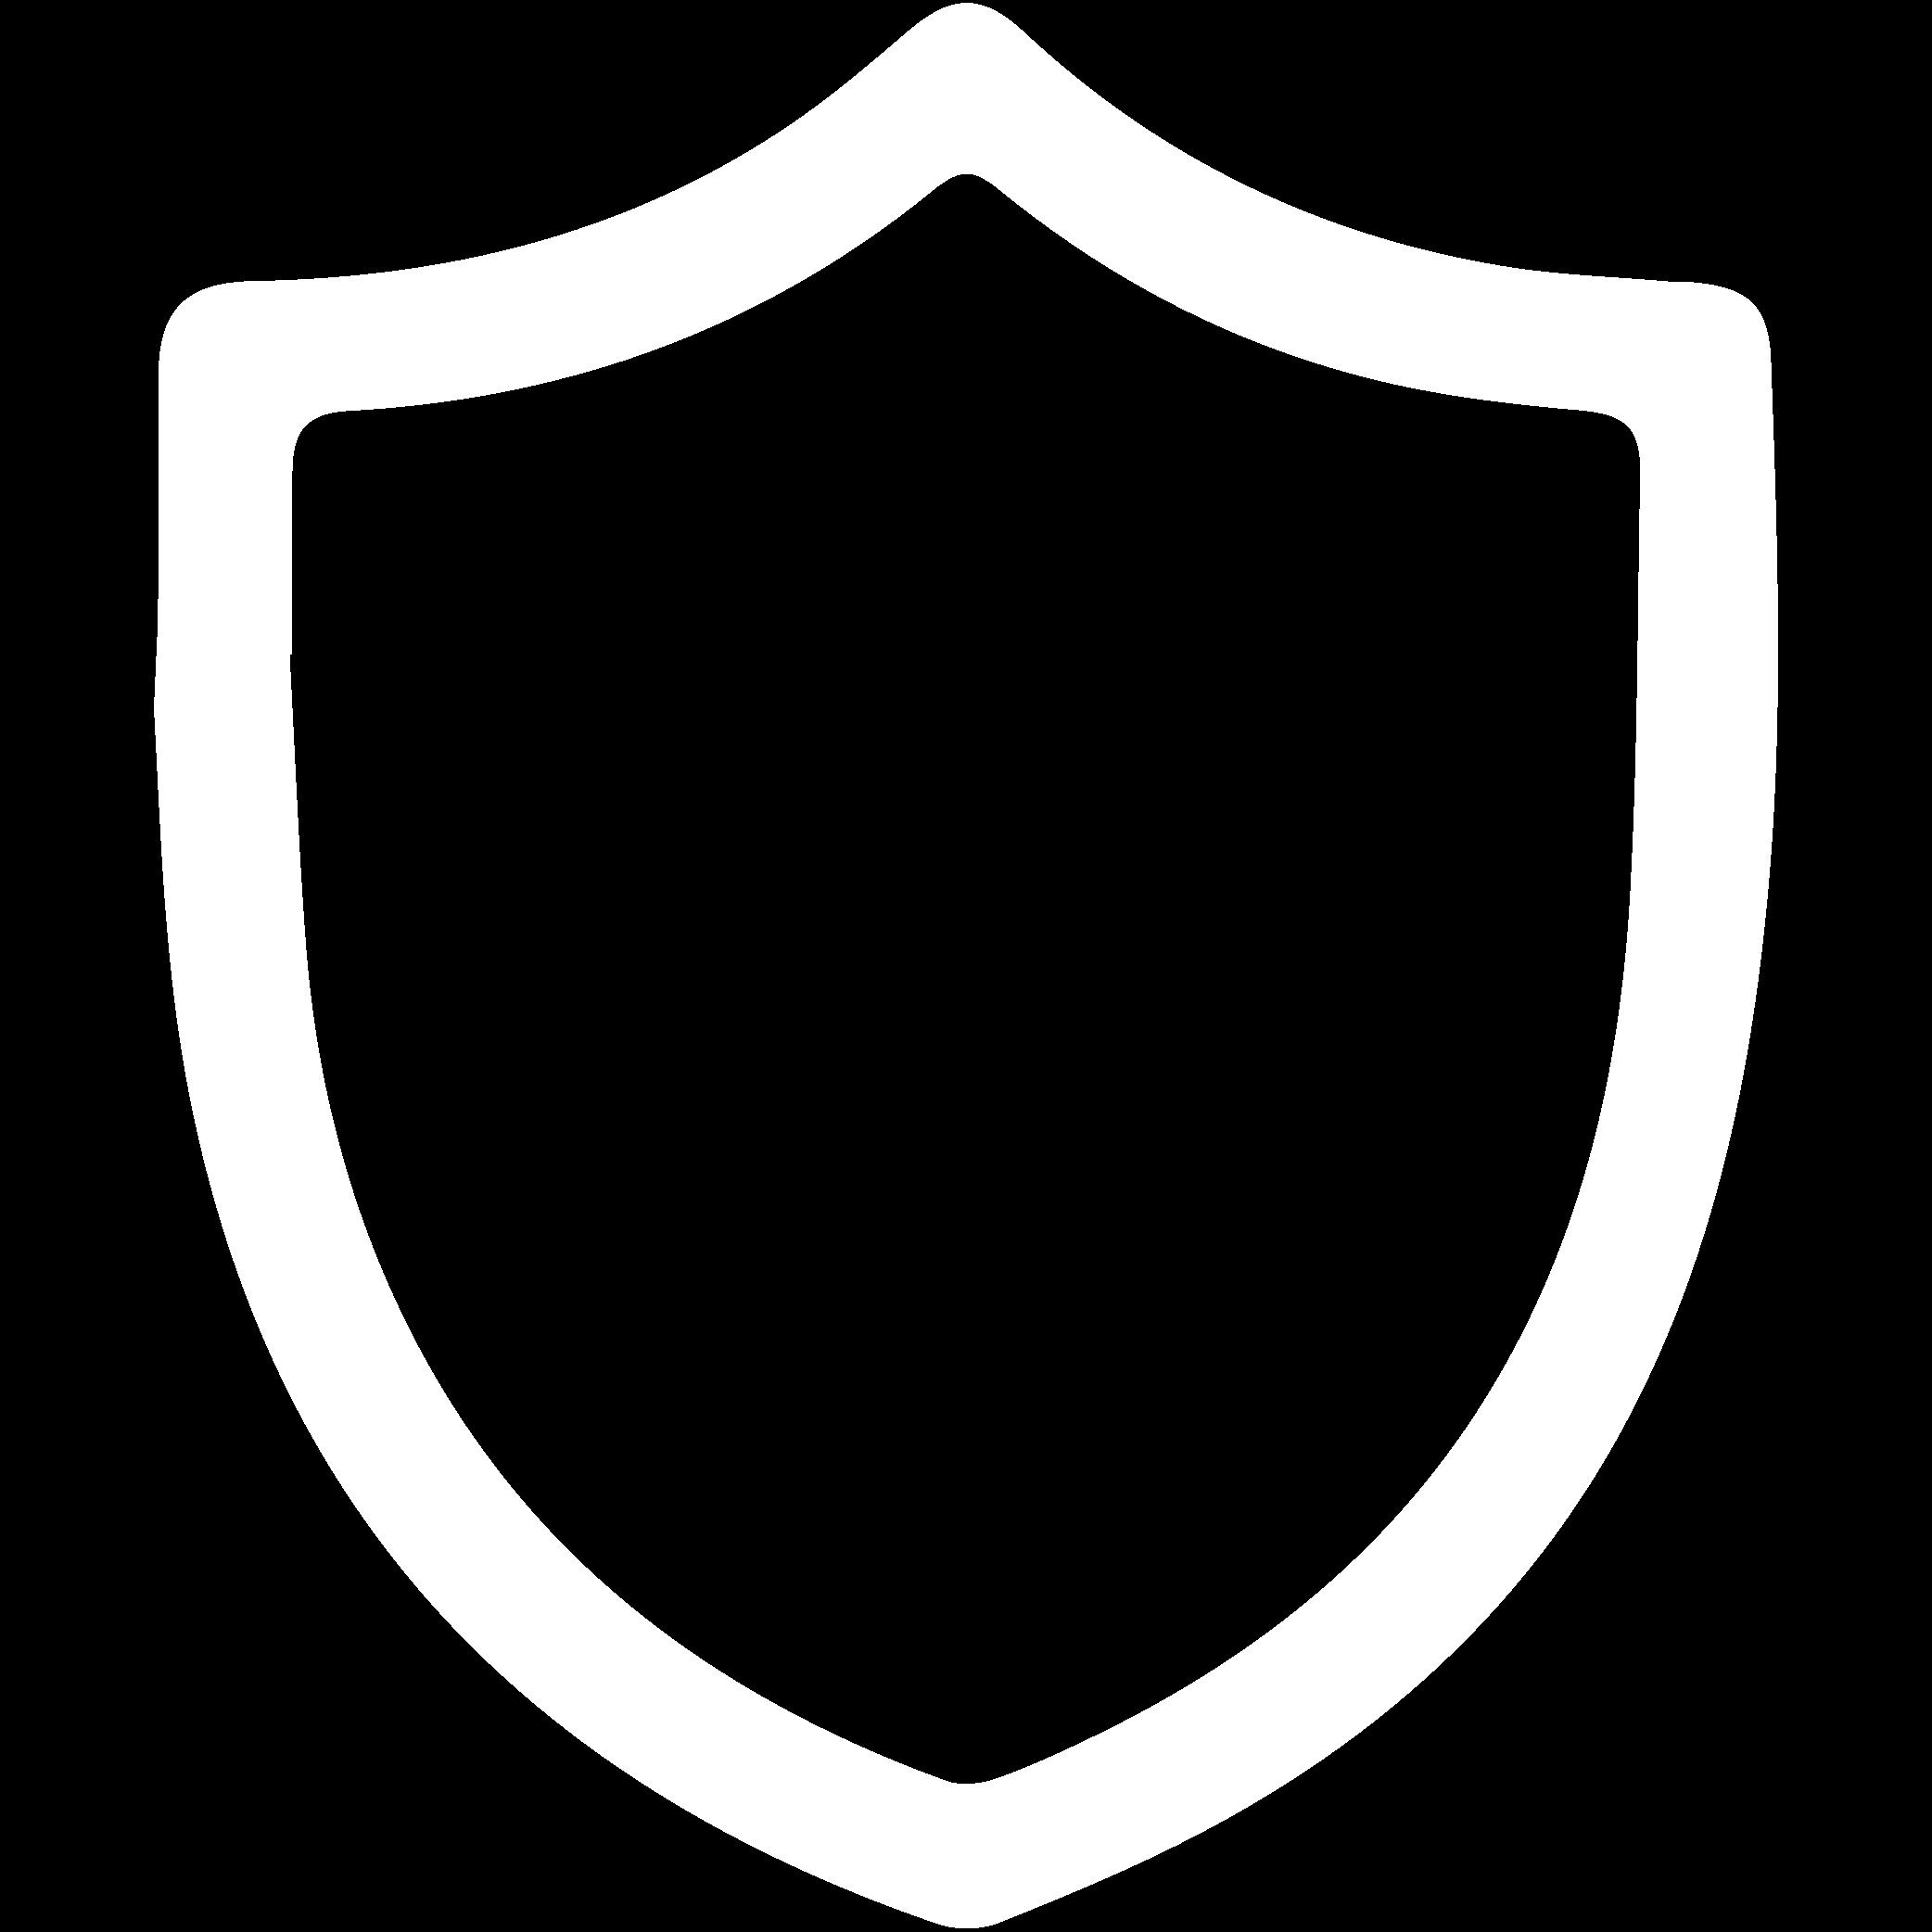 emi rf shielding electronics protection